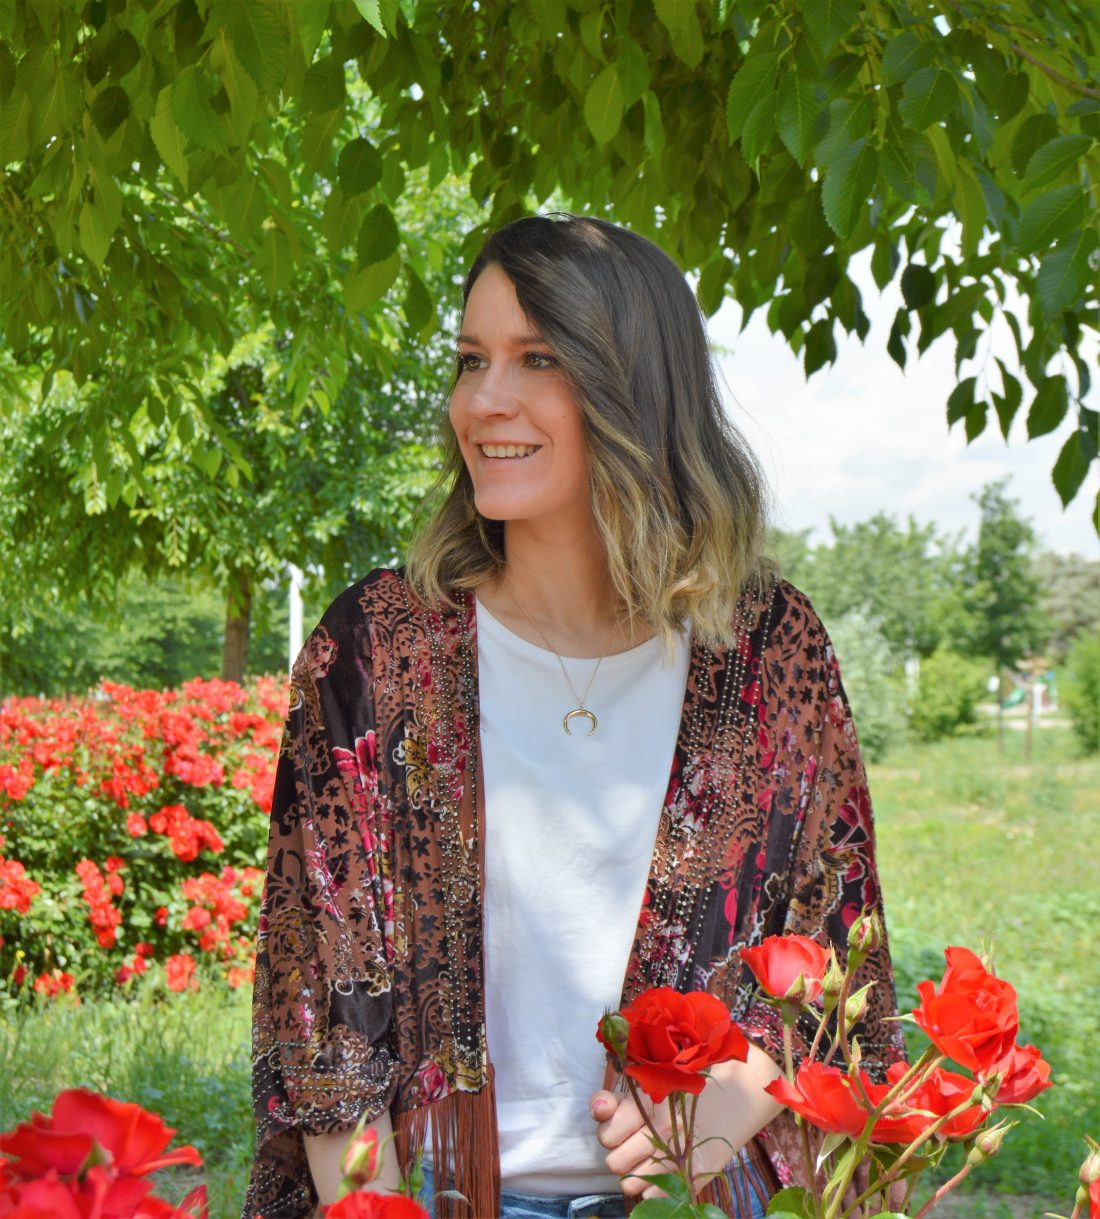 Blogger de moda granada Ursula Padima